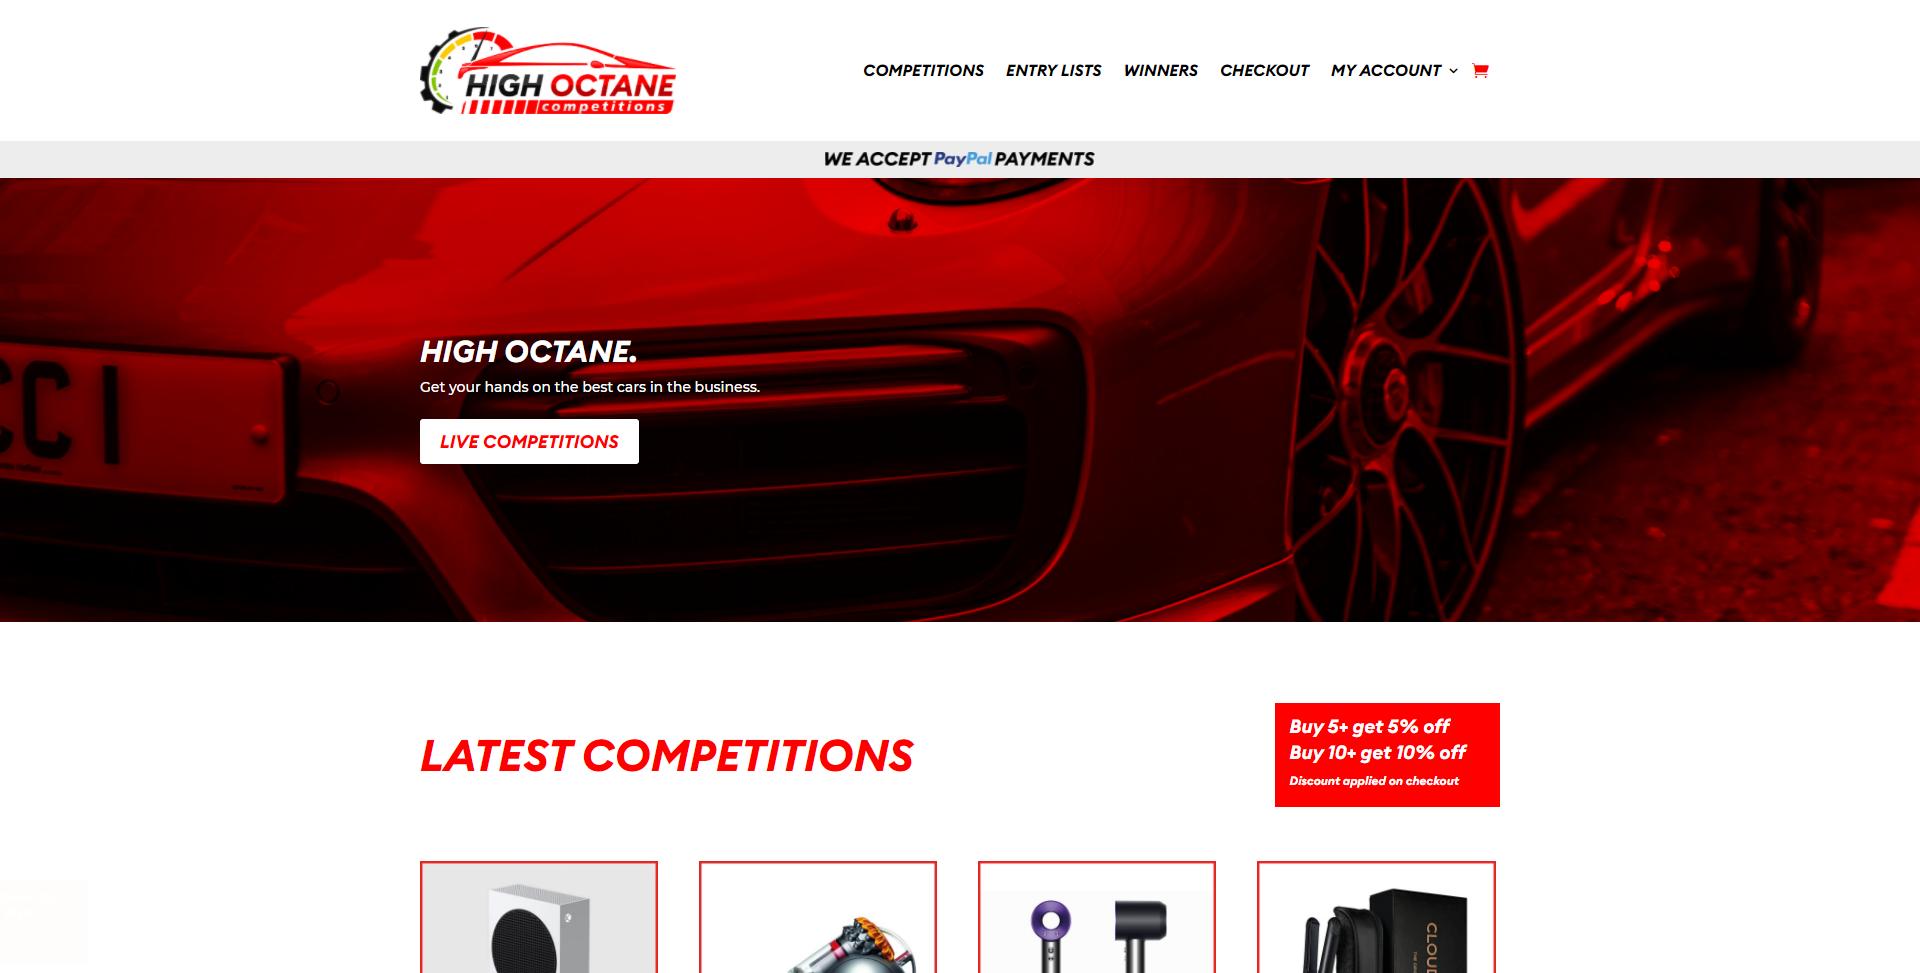 highoctanecompetitions.co .uk Websites